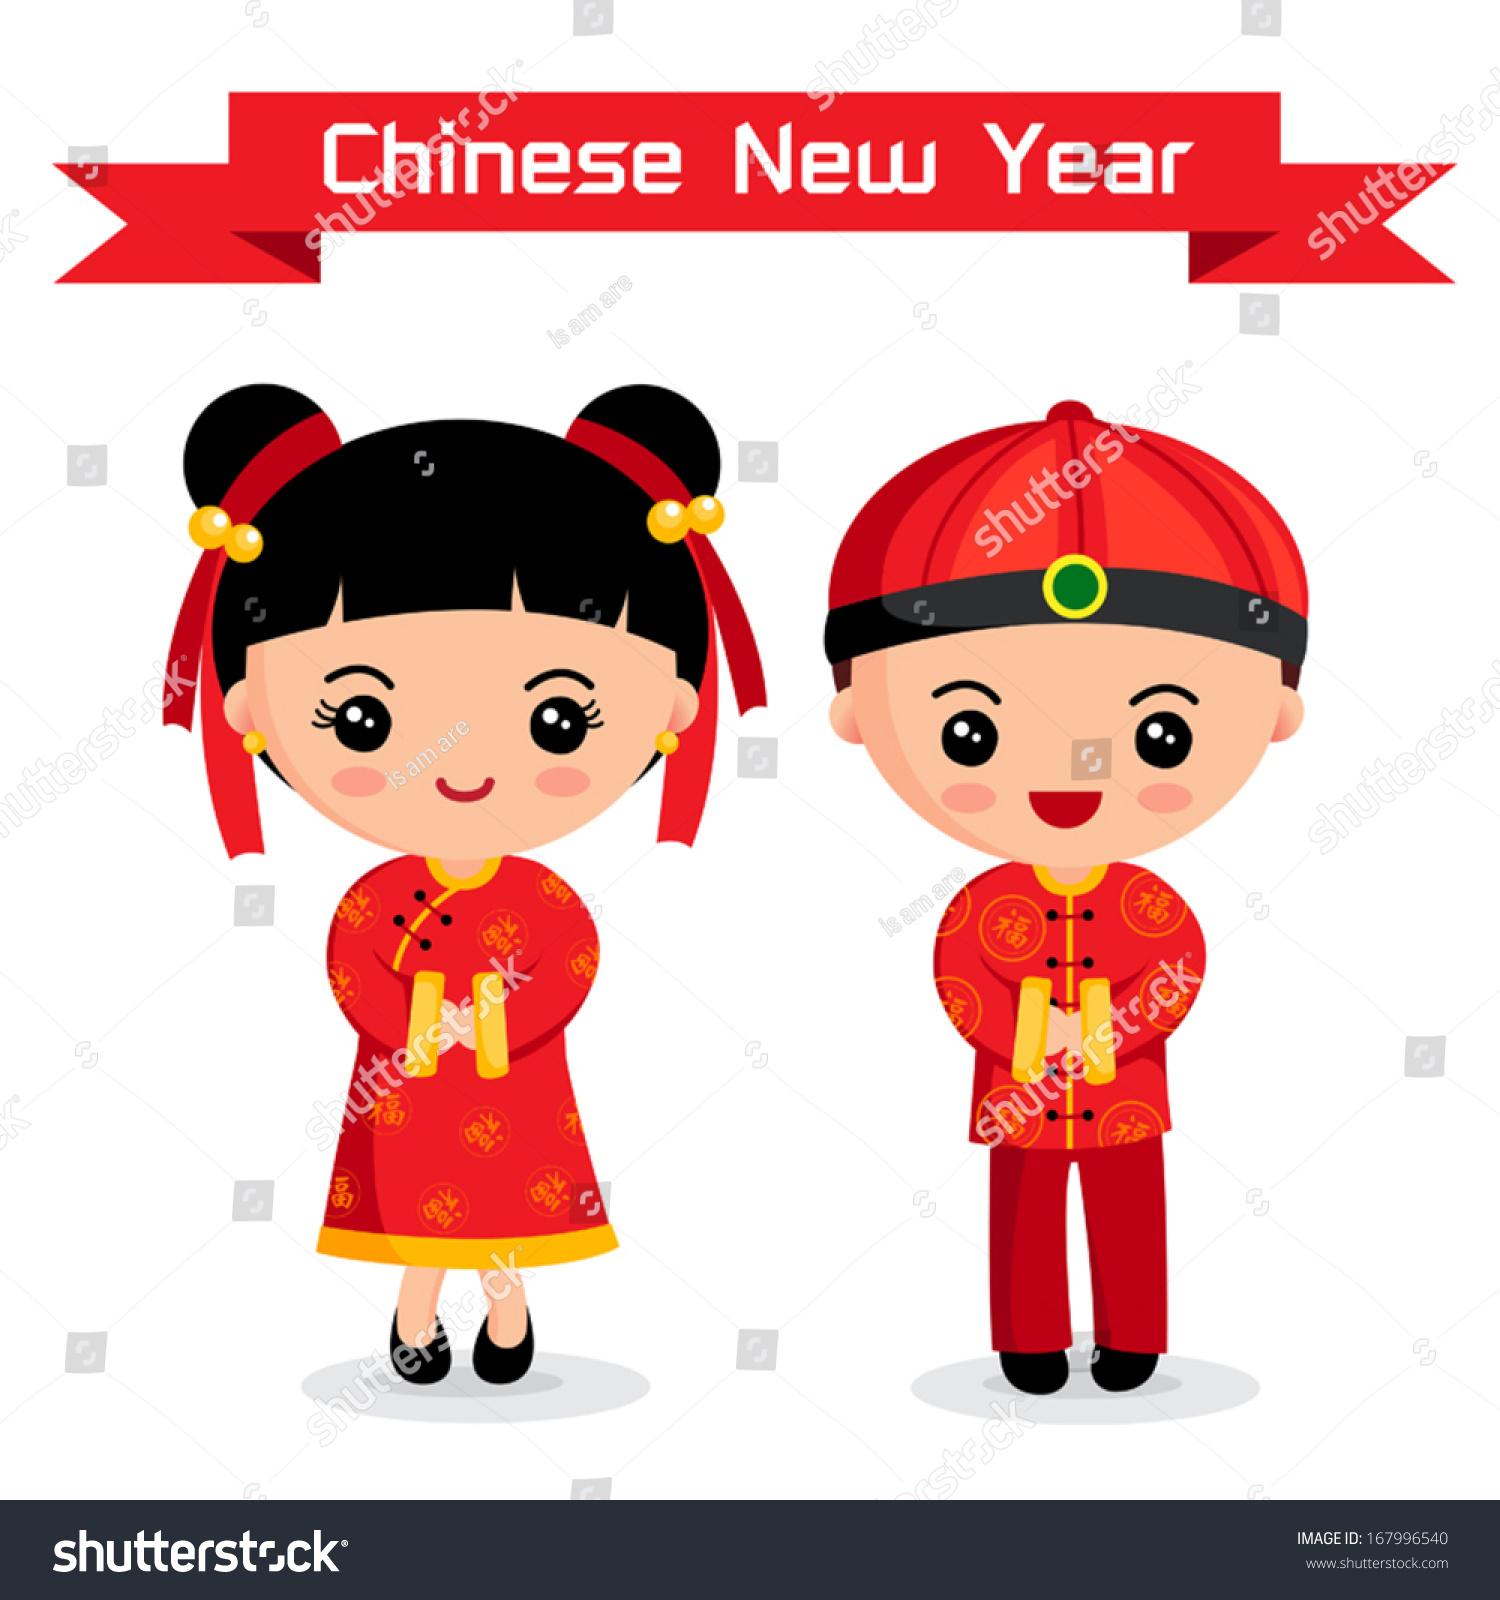 Royalty-free Cartoon of Chinese Boy & Girl, Chinese… #167996540 ...